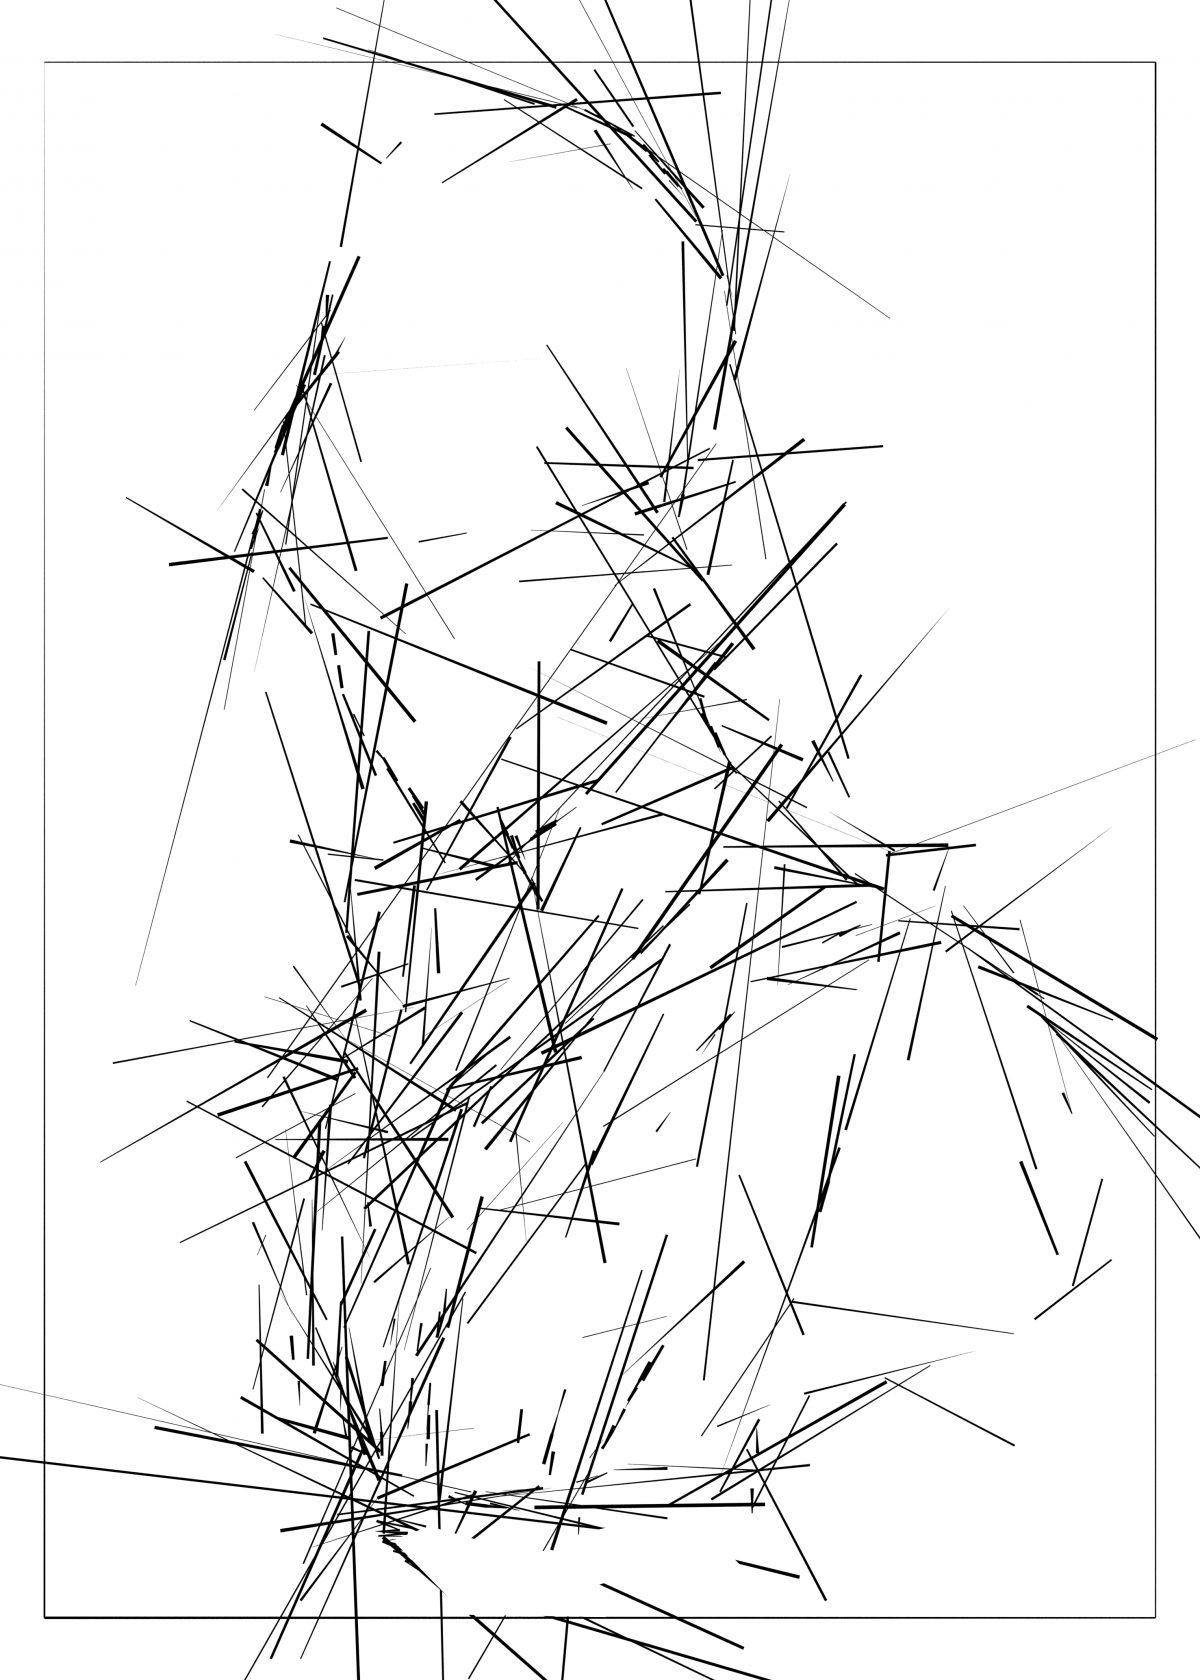 Athena, generative, raster